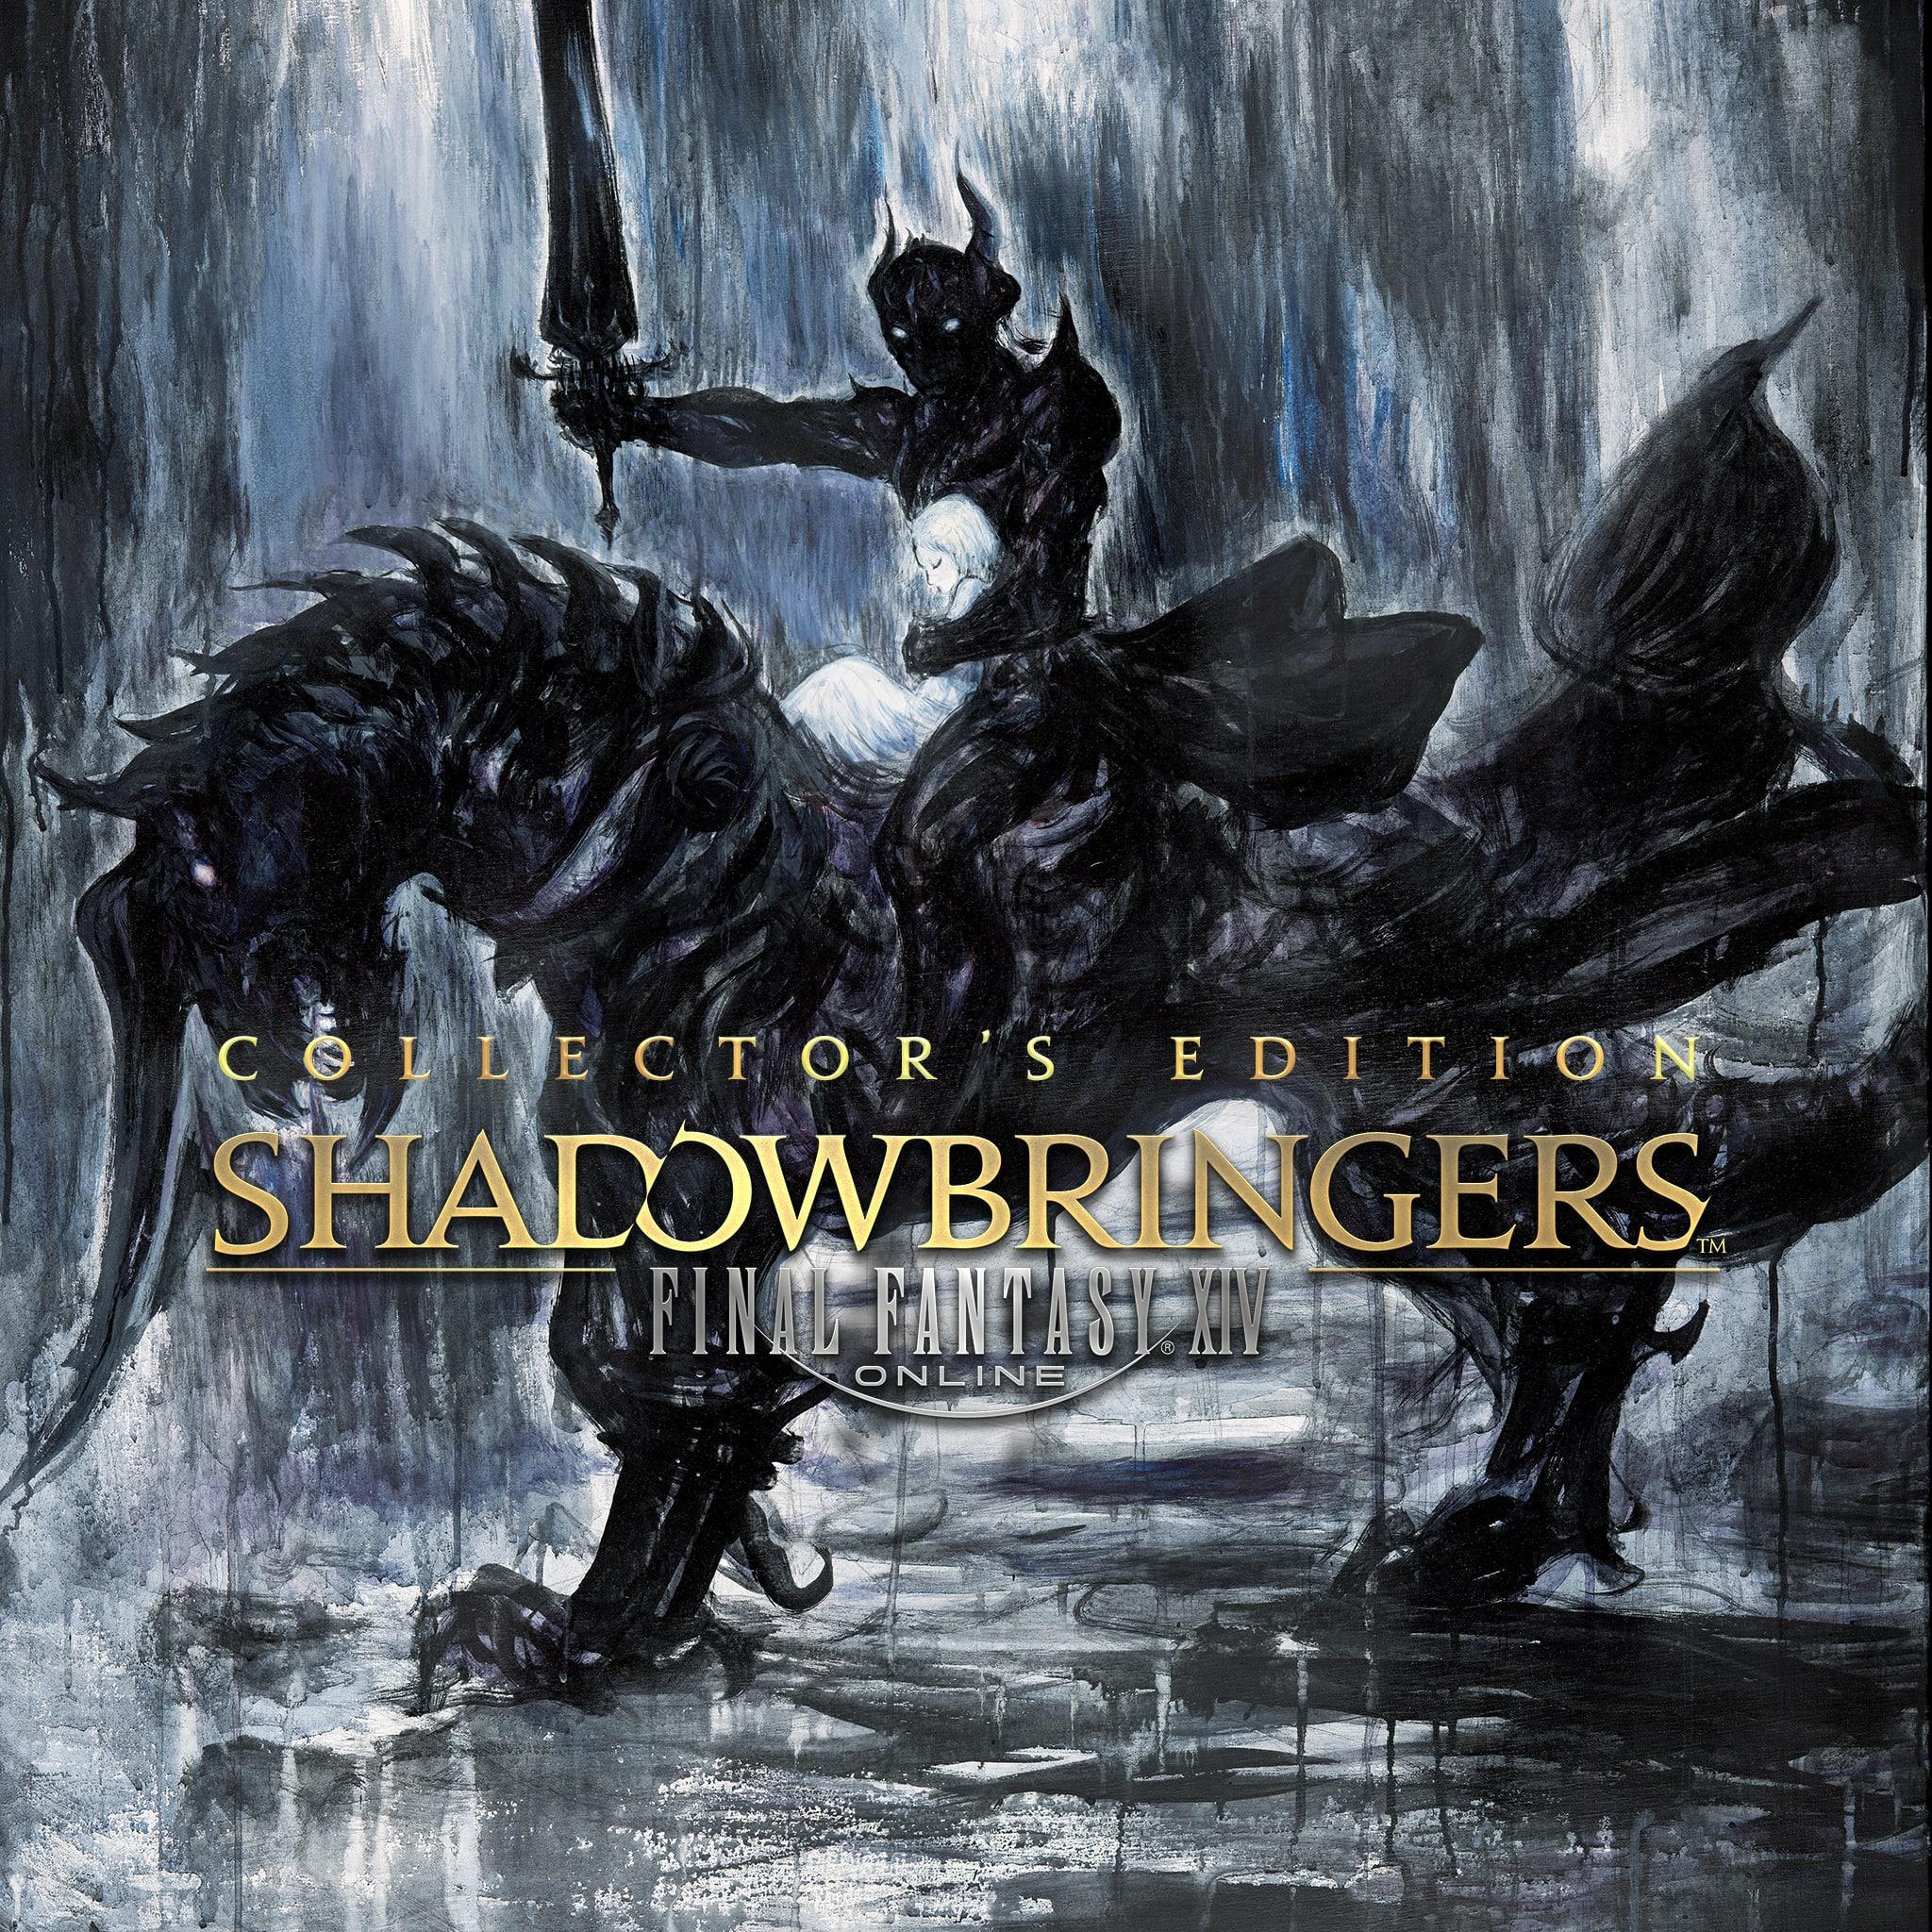 FINAL FANTASY® XIV: Shadowbringers™ Collector's Edition